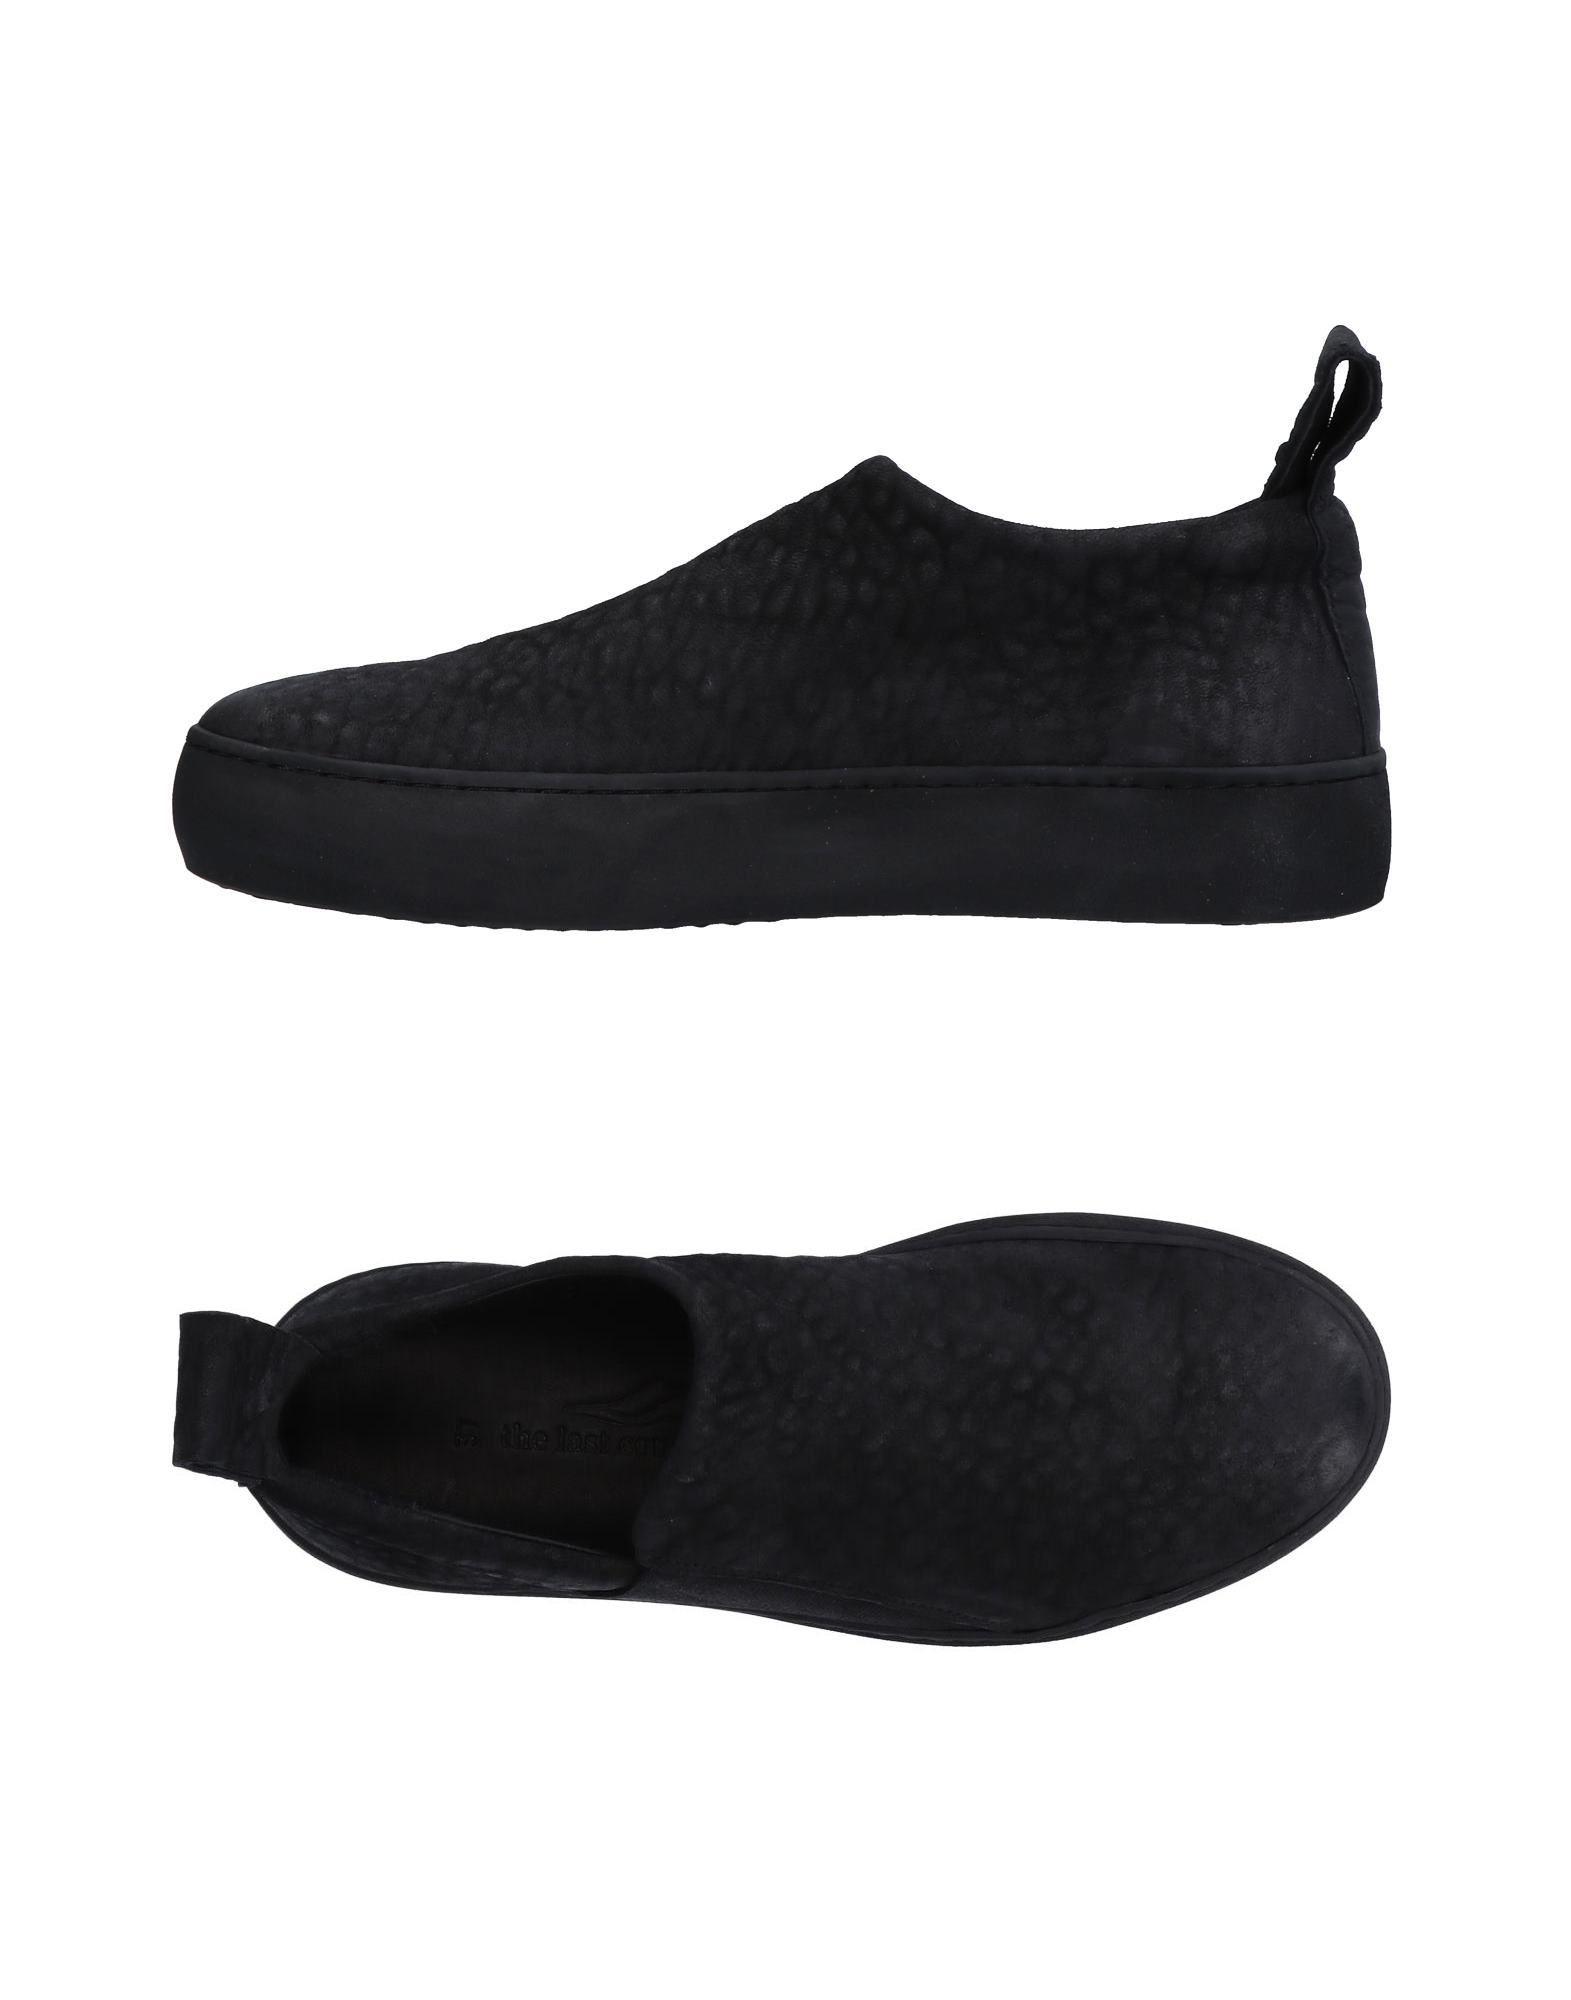 Stilvolle billige Sneakers Schuhe The Last Conspiracy Sneakers billige Damen  11517270GB ef85ef